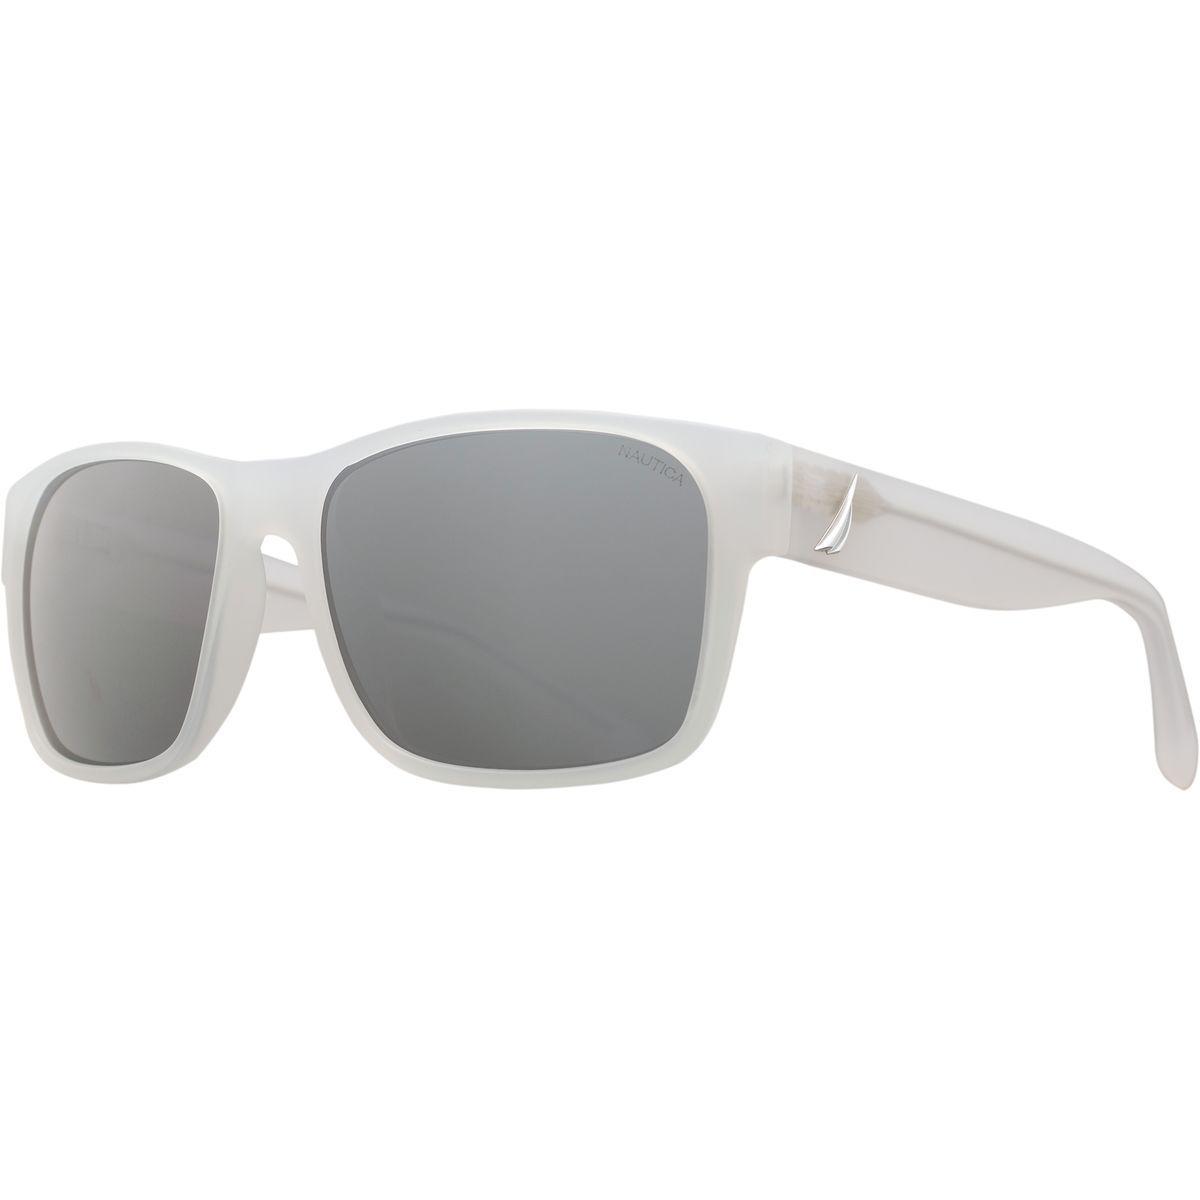 c27e588b6ce Lyst - Nautica N6196s Sunglasses for Men